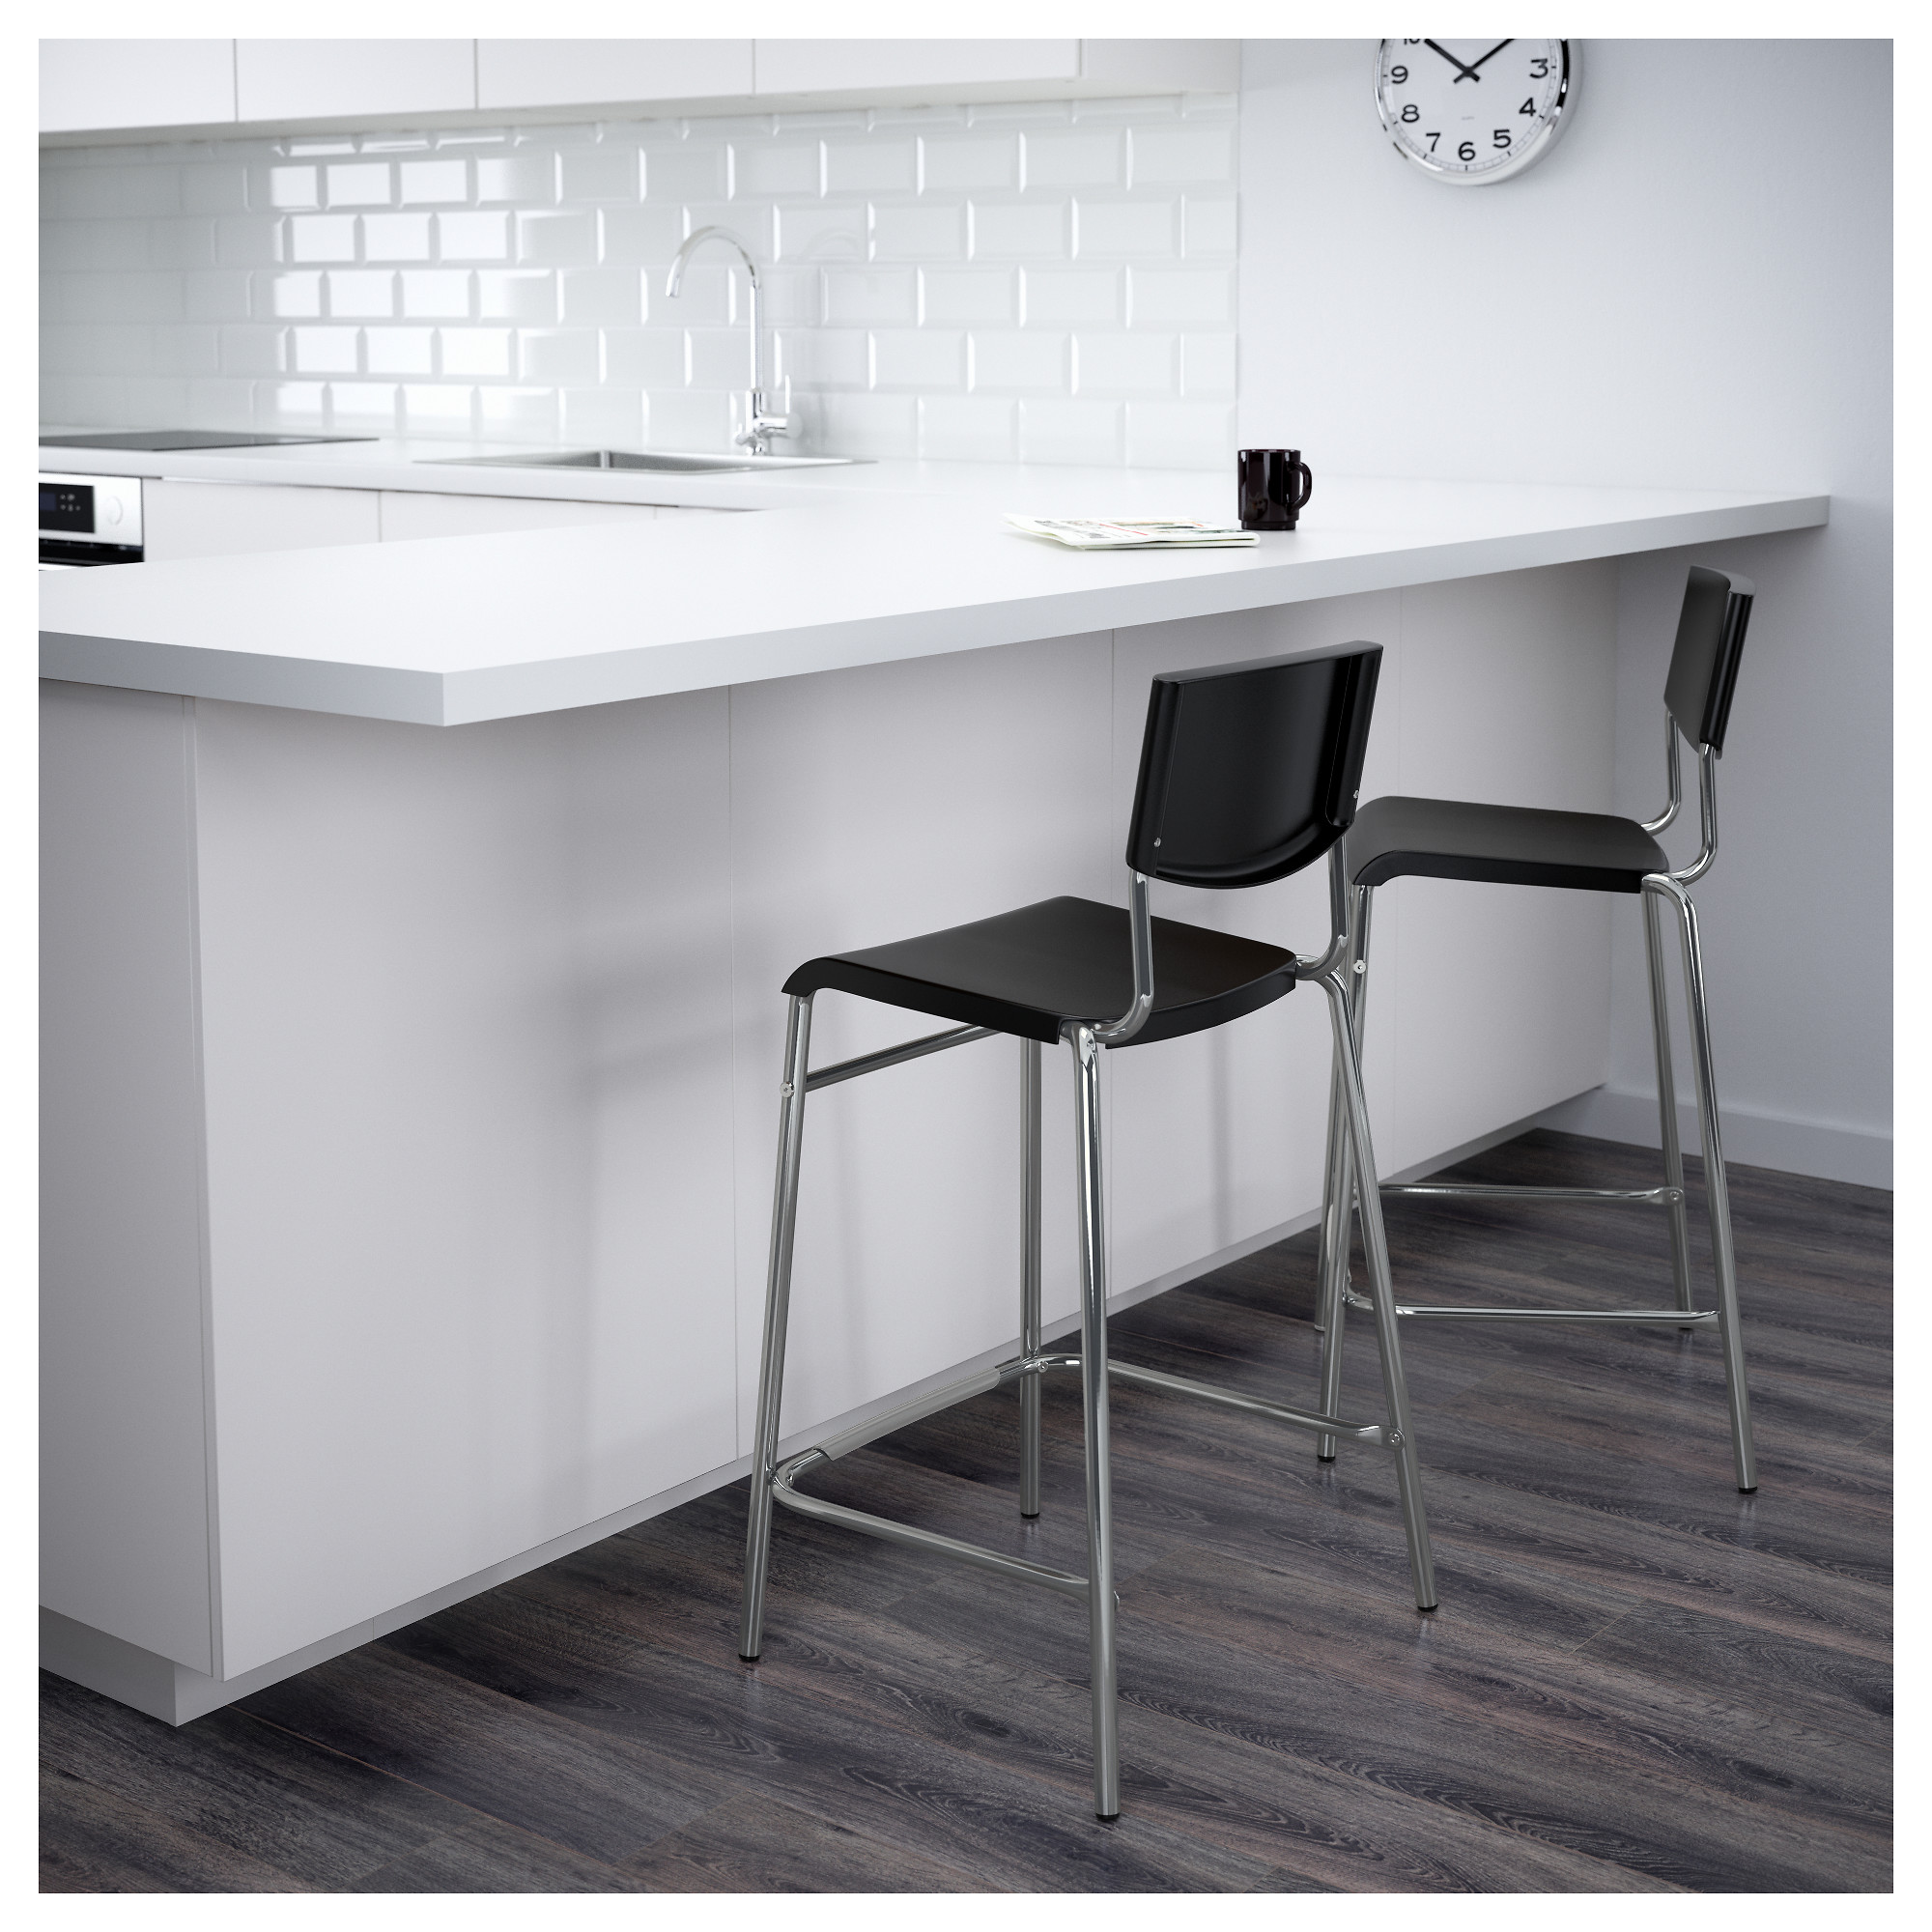 Taburete Stig.Stig Bar Stool With Backrest Black Silver Colour Ikea